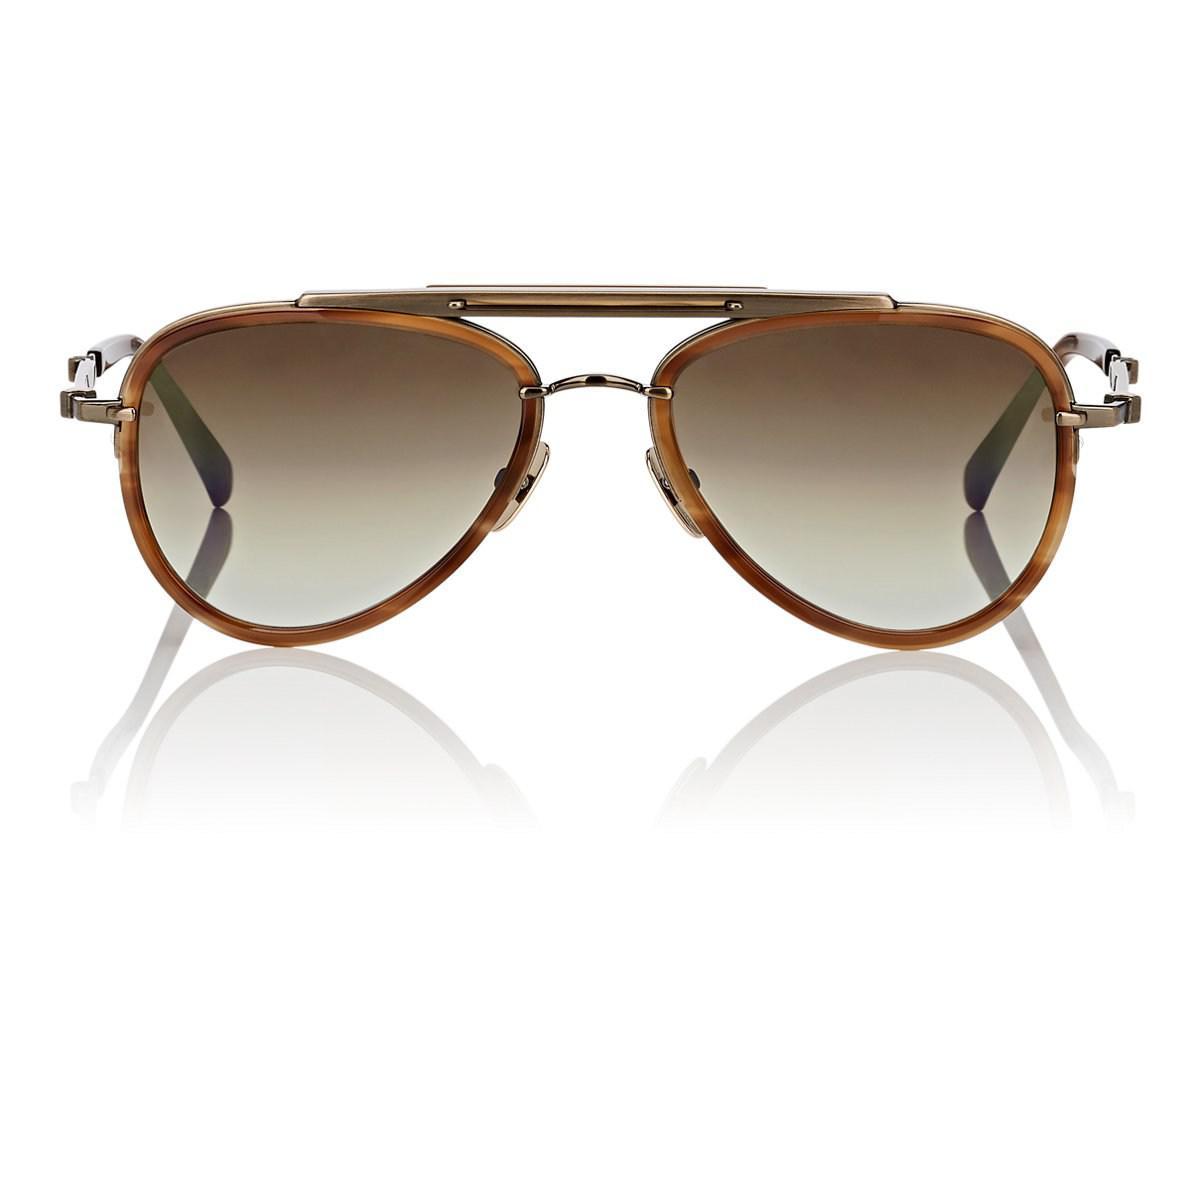 Laurel SL Aviator-Style Acetate And Metal Sunglasses Mr. Leight jAKGdp